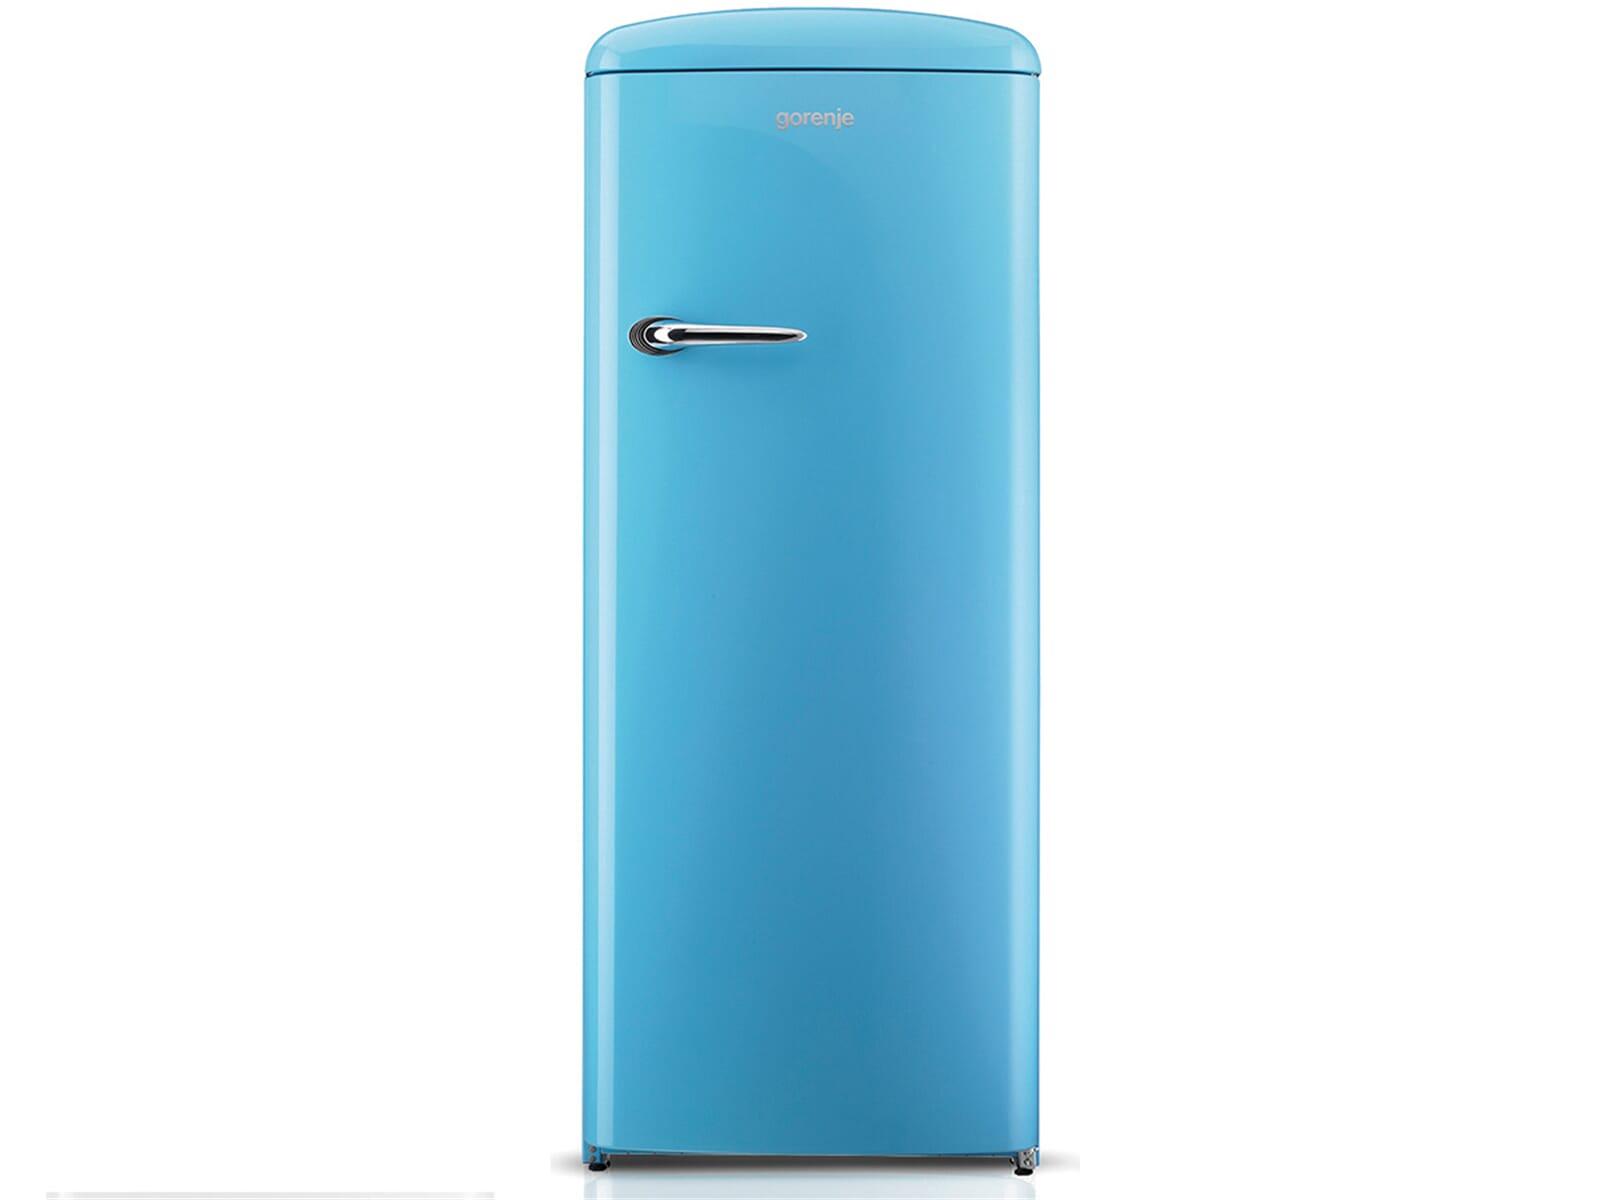 Gorenje Kühlschrank Hi1526 : Kühlschrank blau gorenje lisa brasel